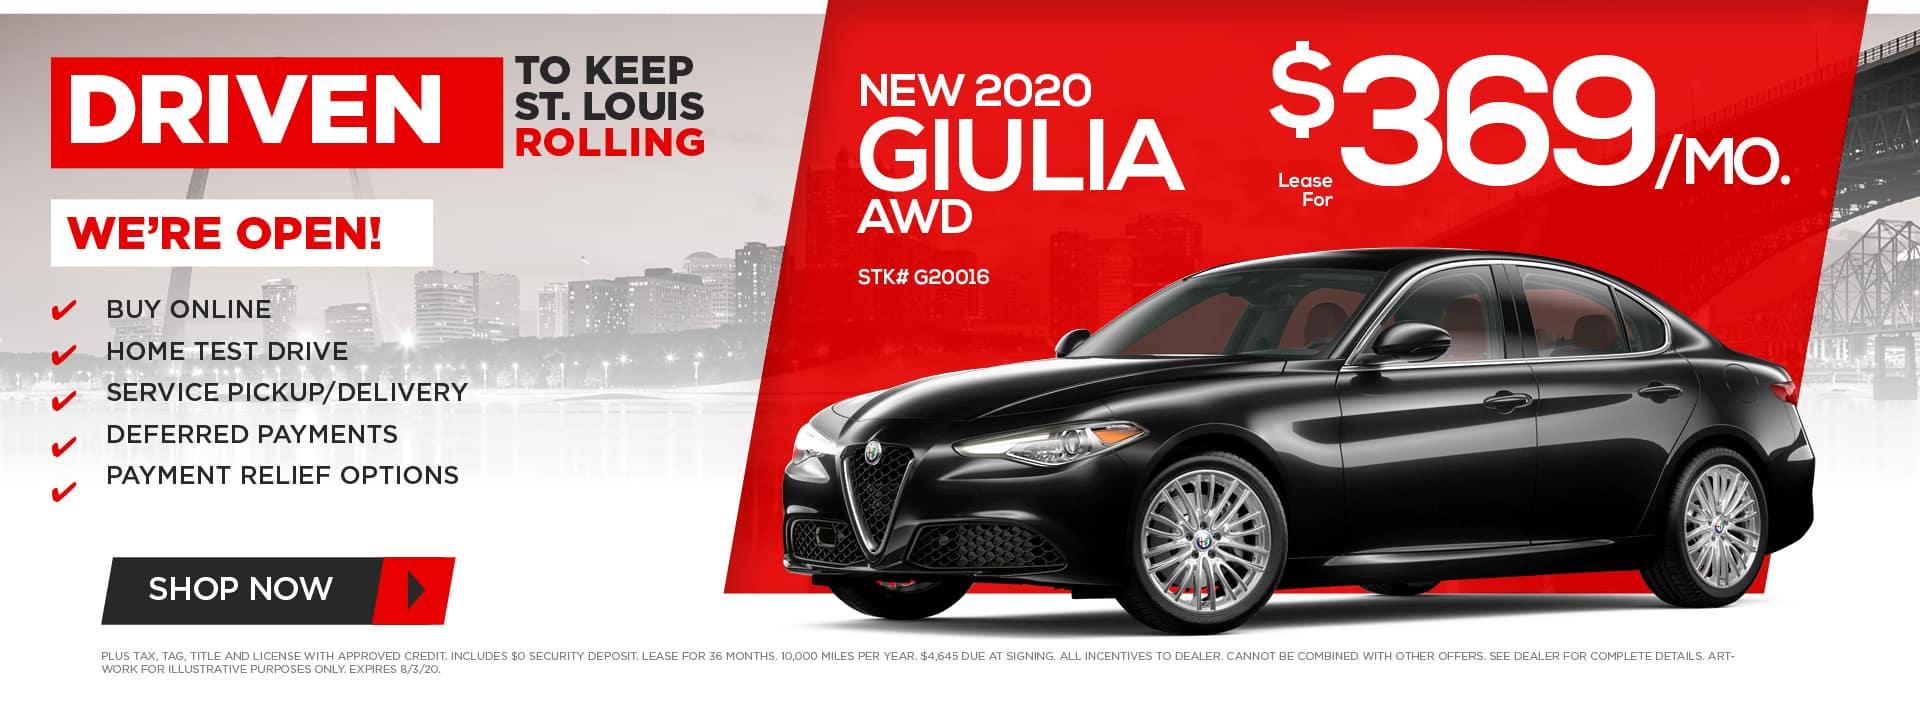 New 2020 Giulia